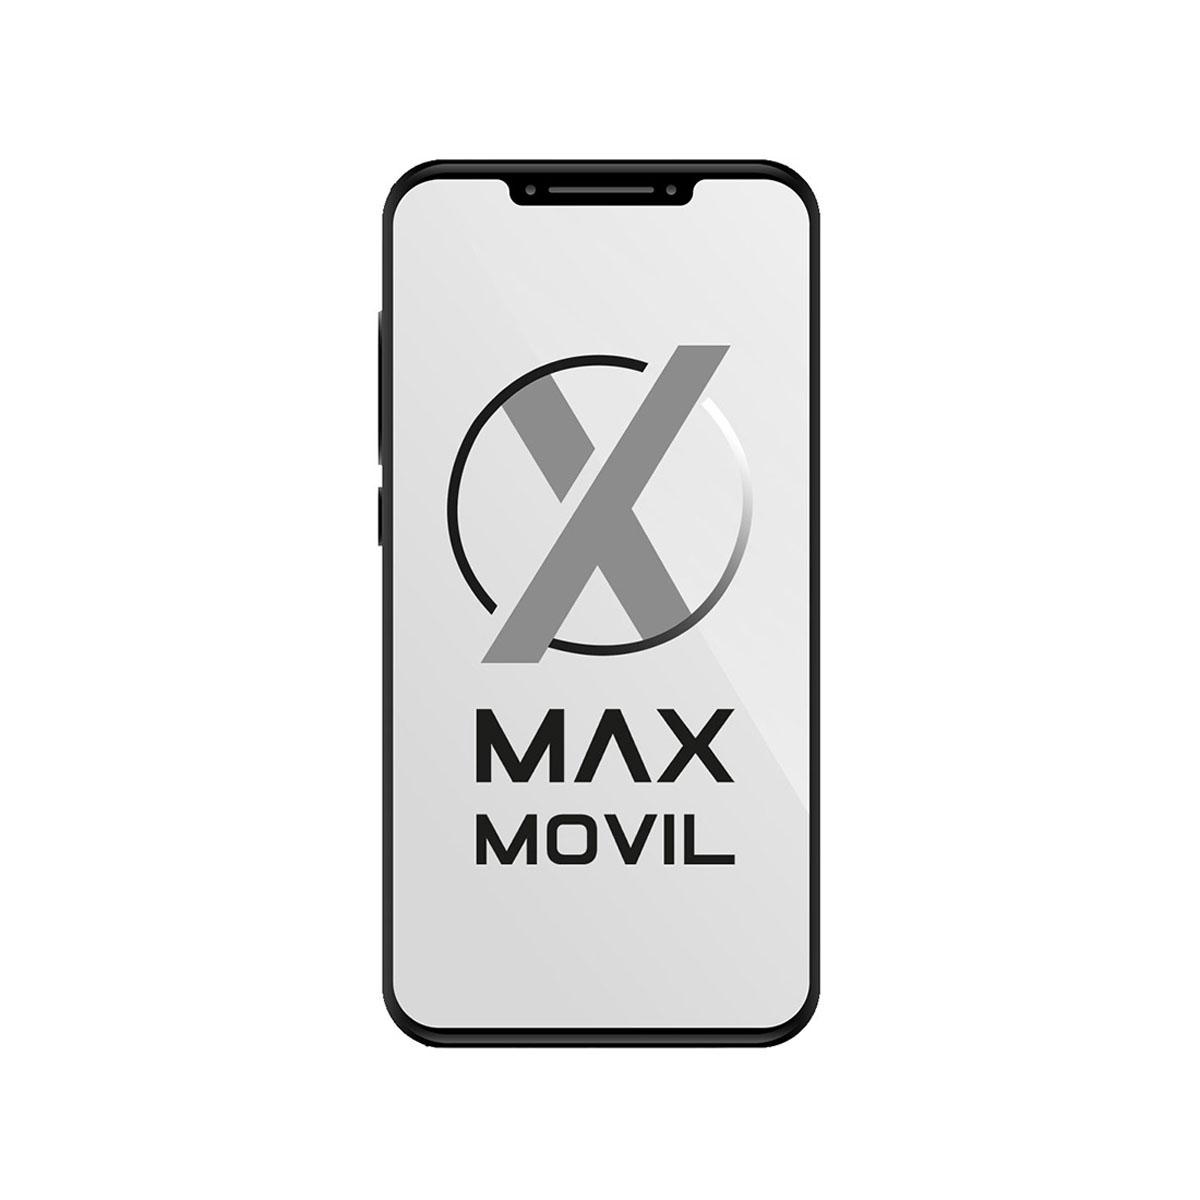 Carcasa transparente para iPhone XS Max